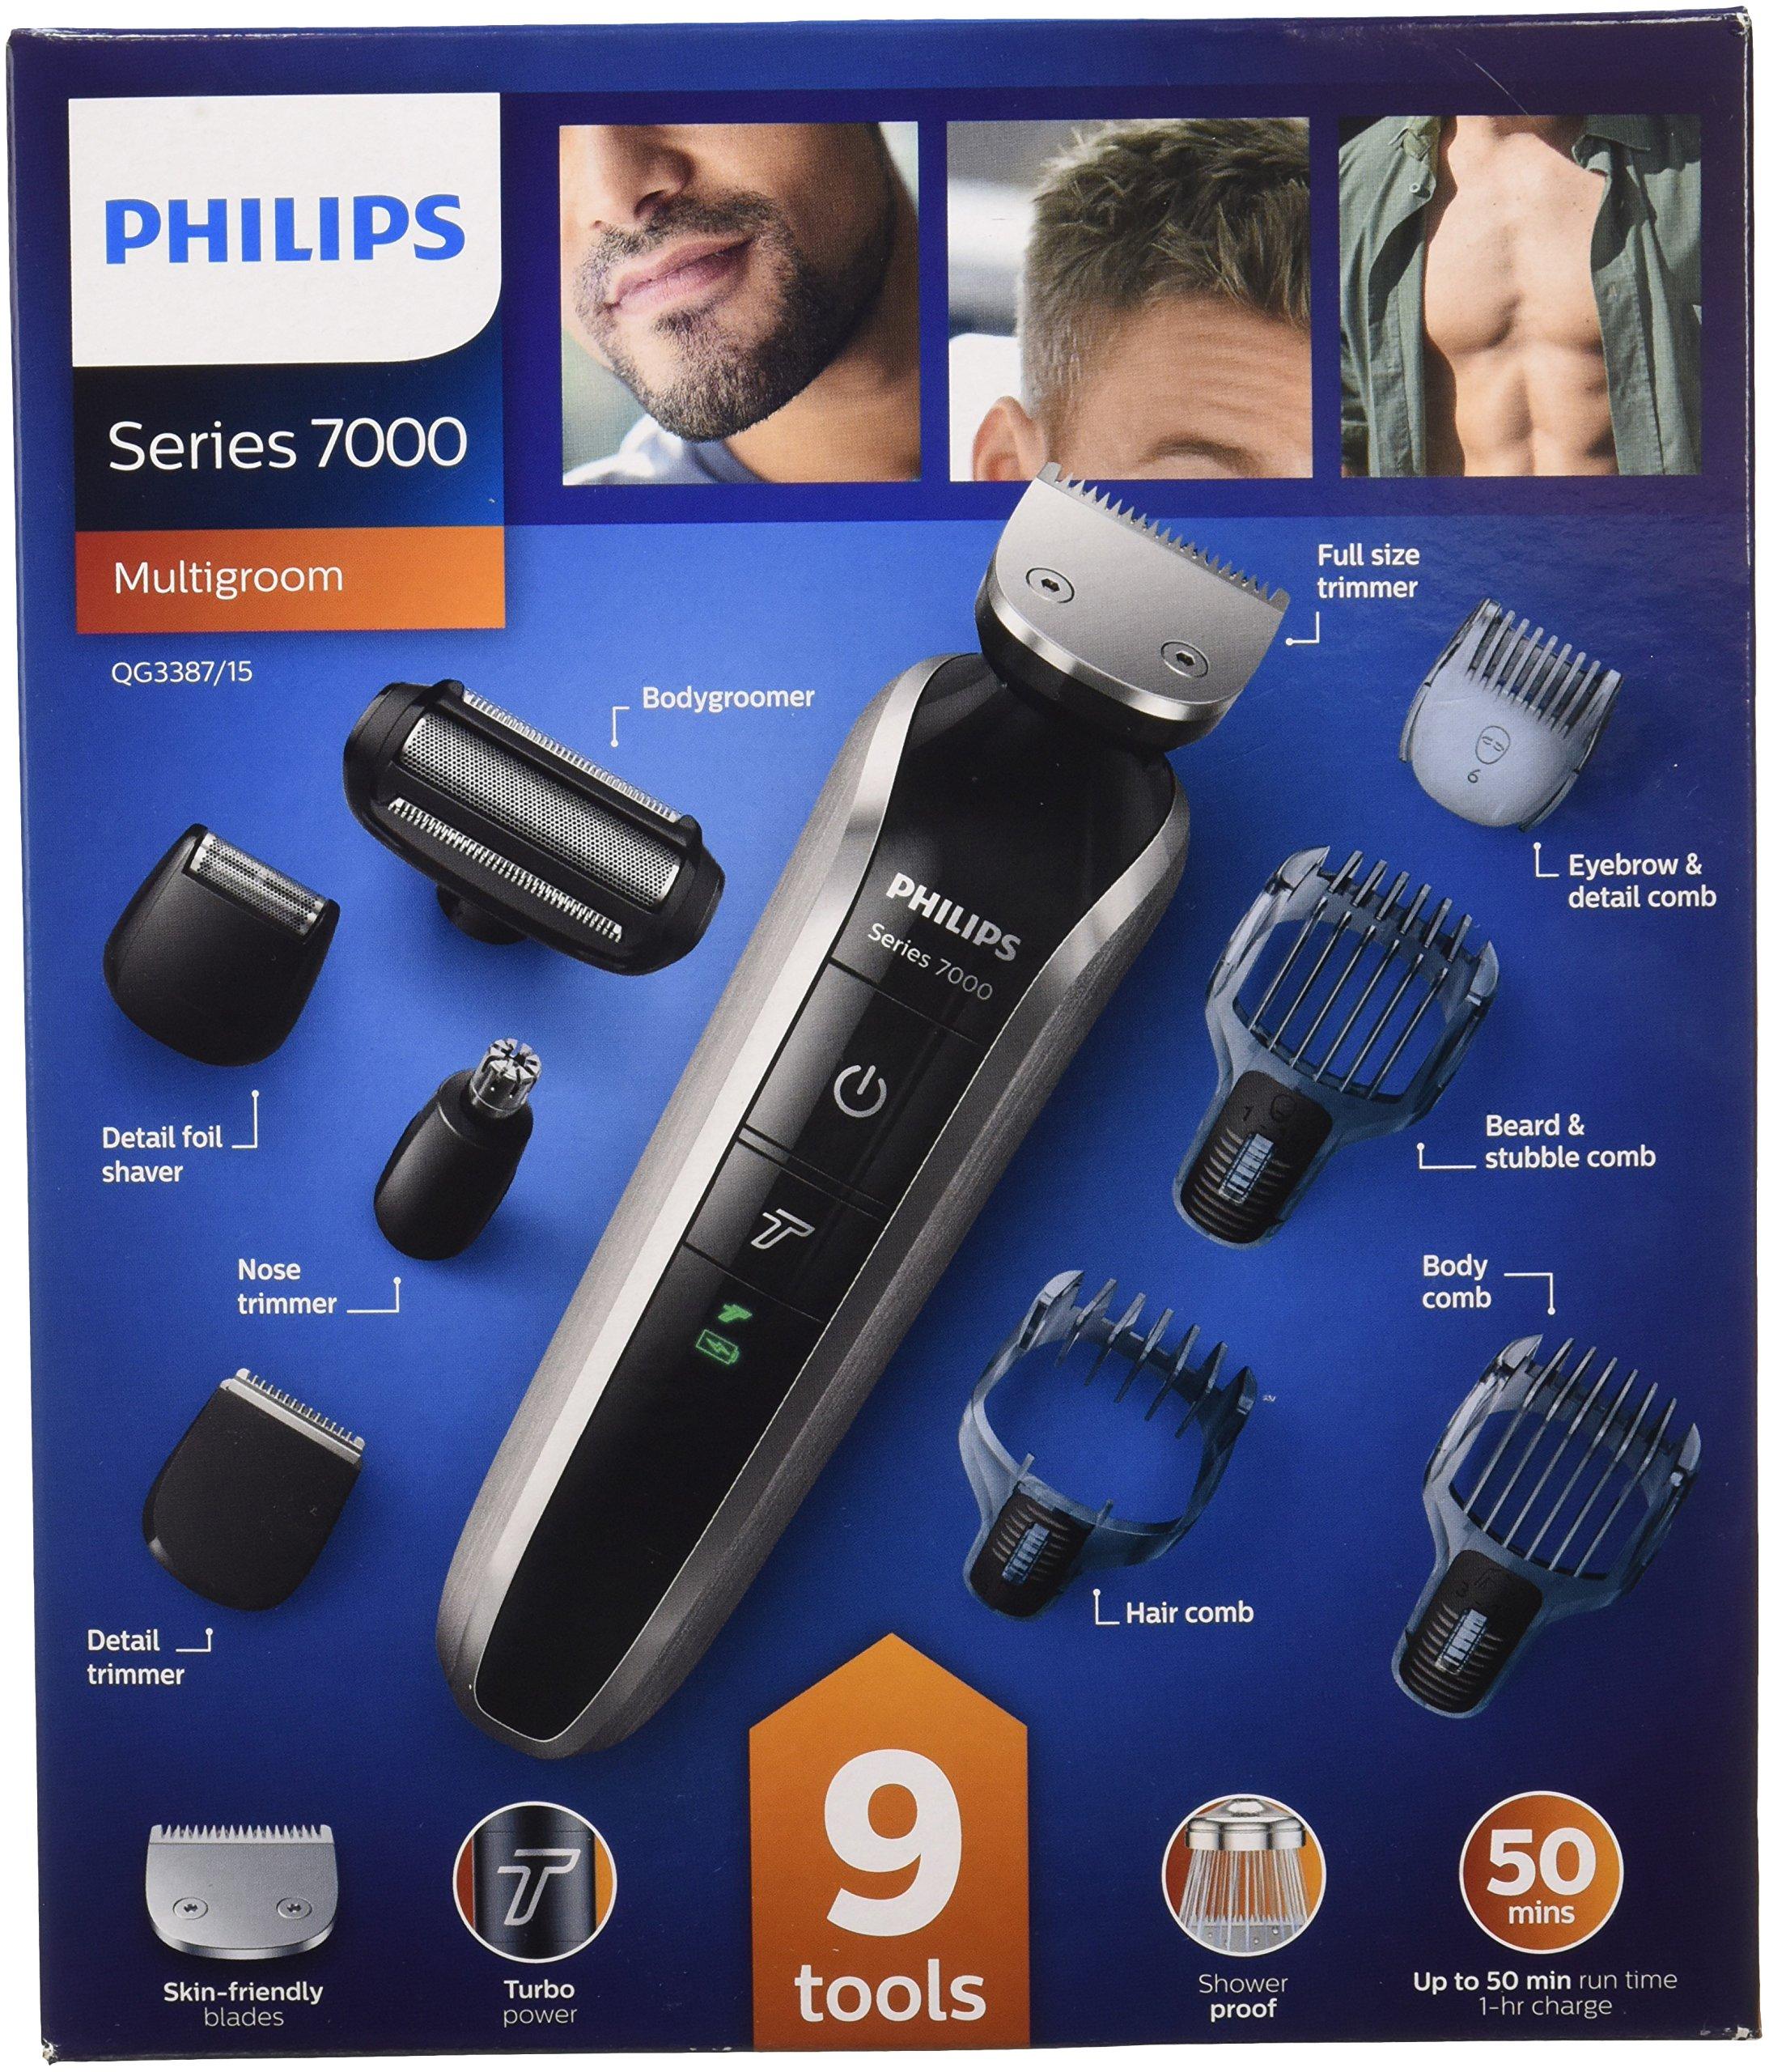 Philips QG3387 Multi Grooming Kit (Black)